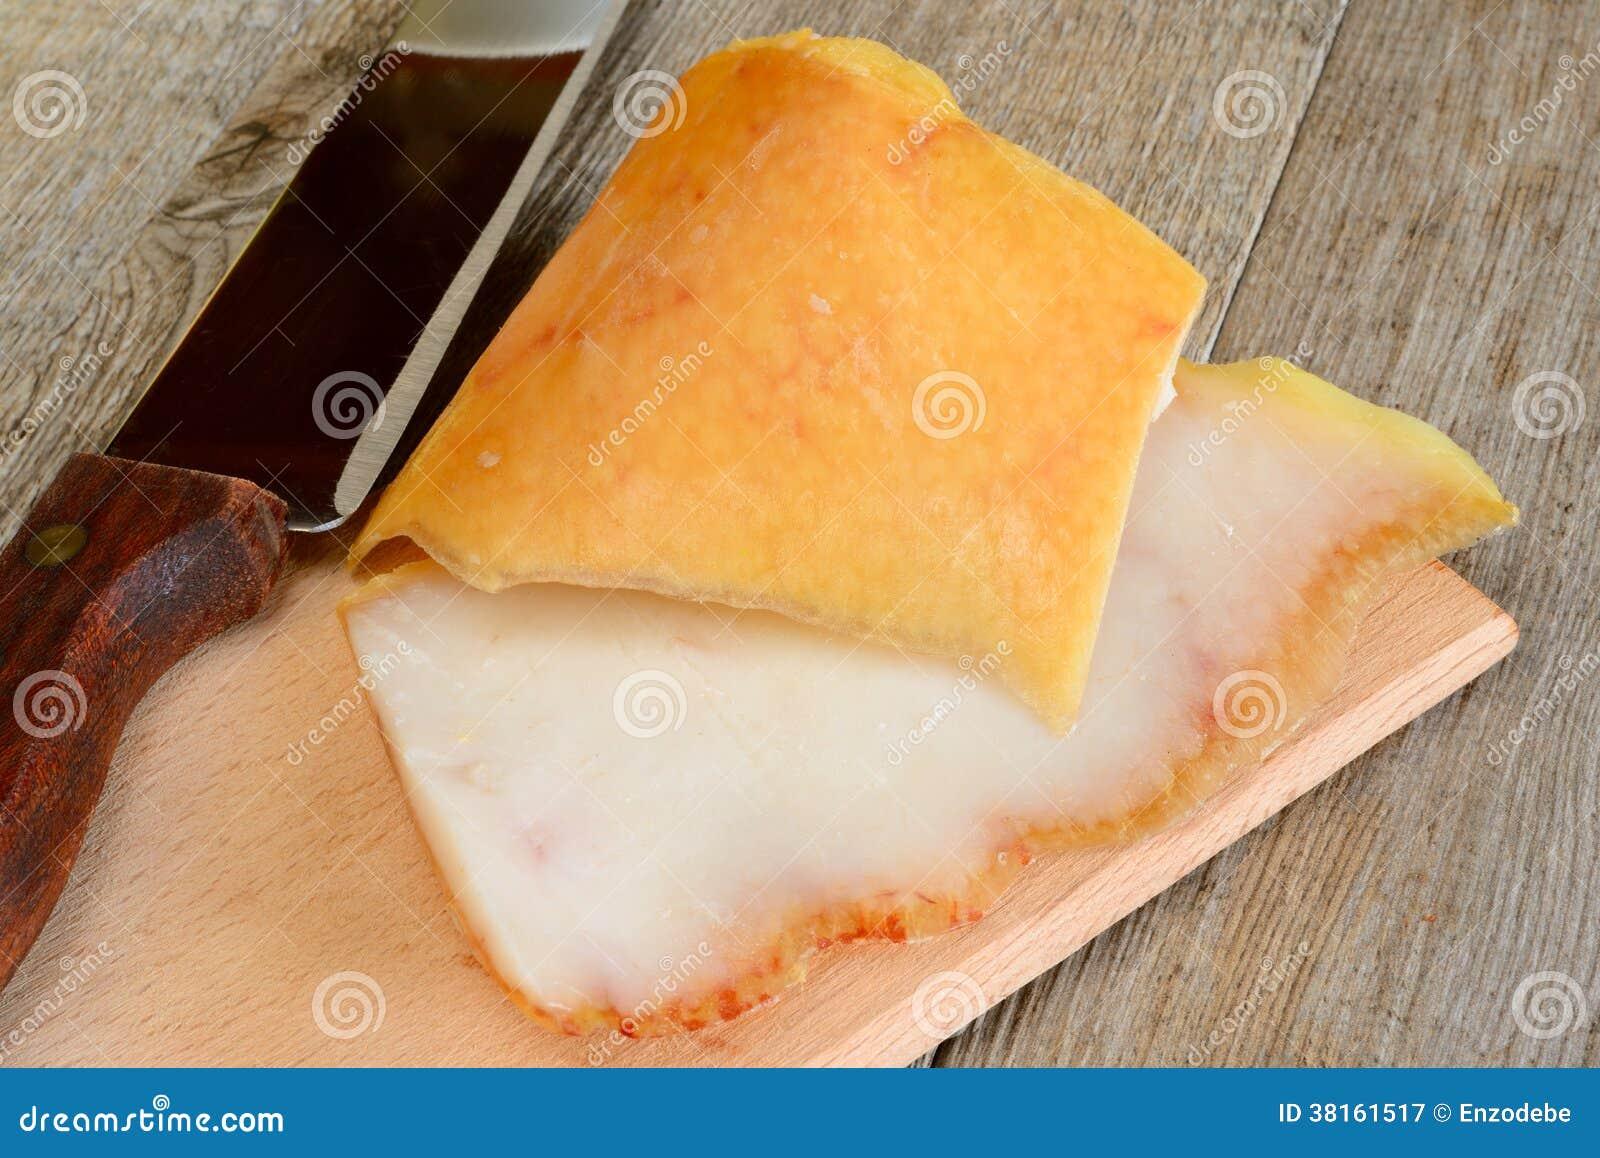 Pork rind